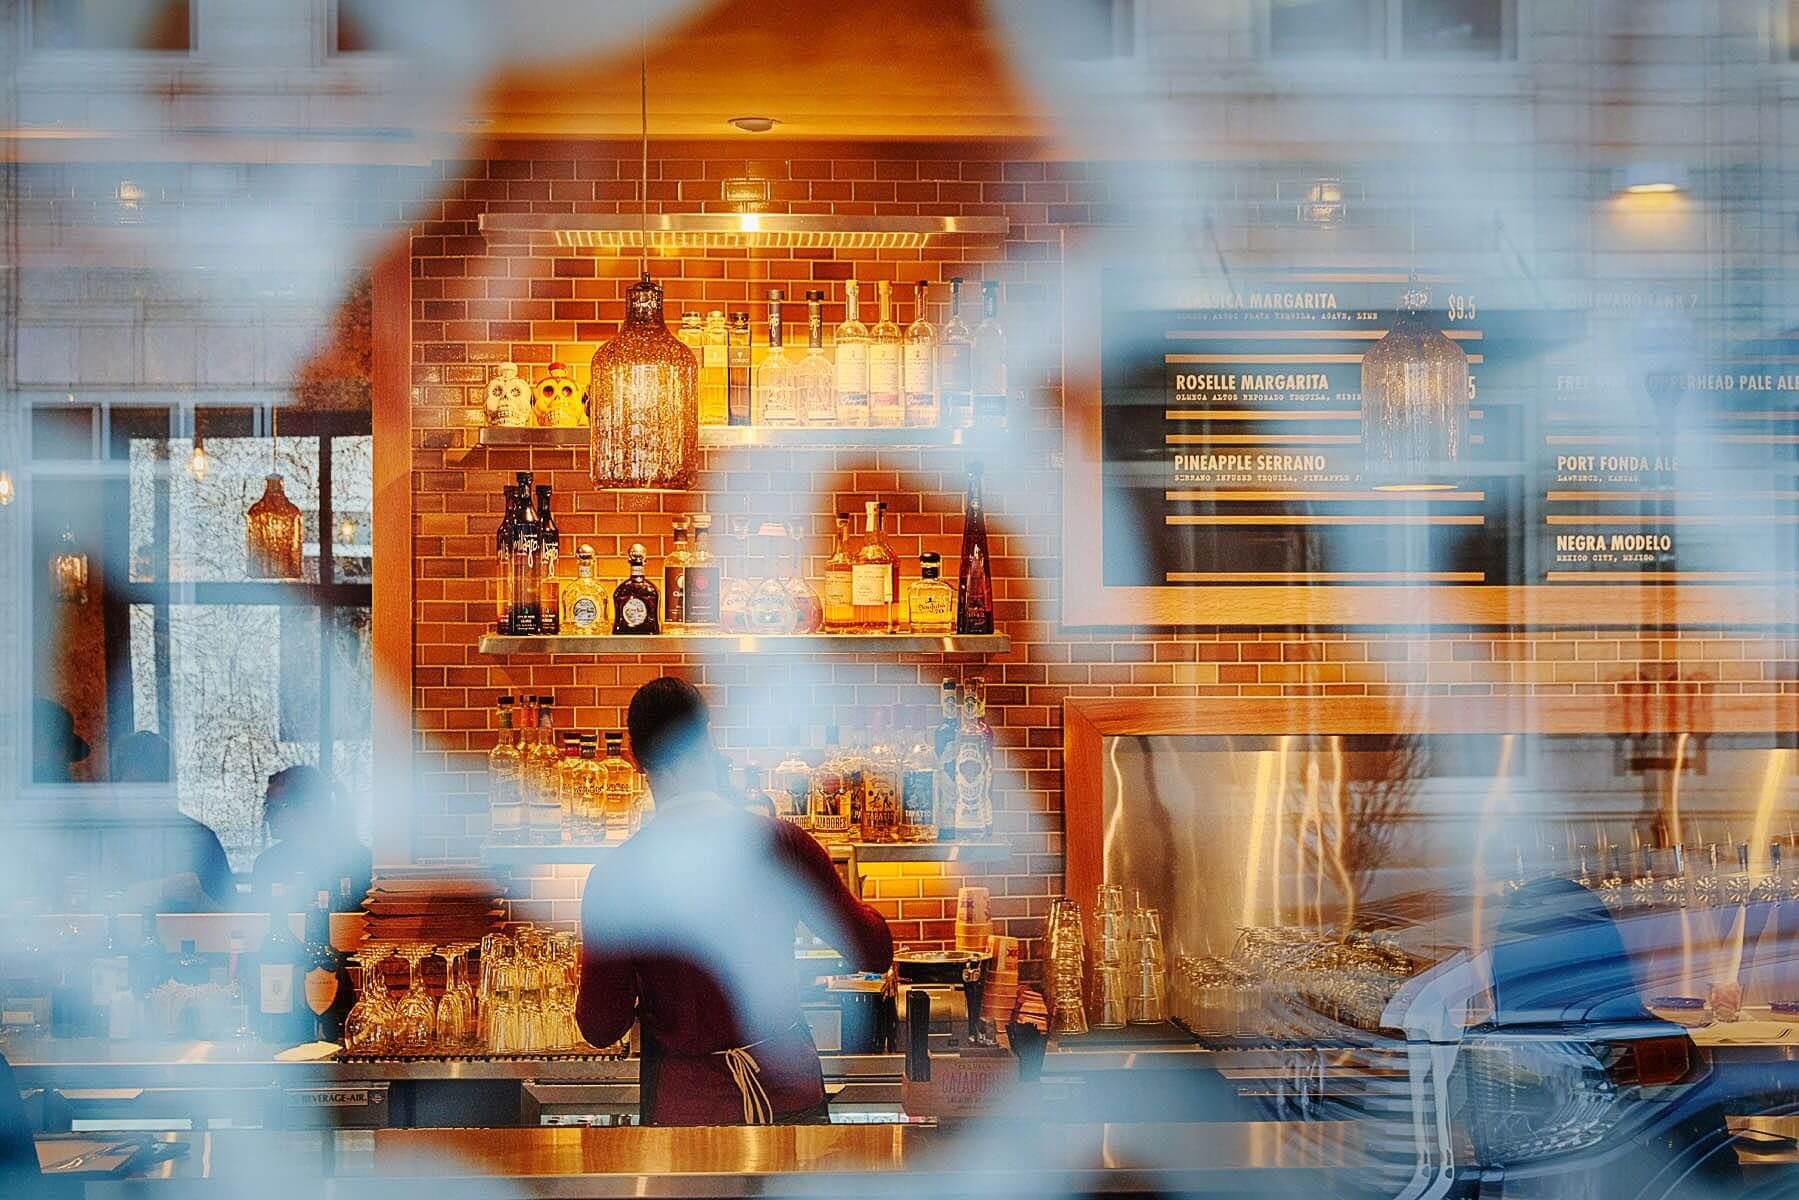 PortFonda-BeerTapSignage